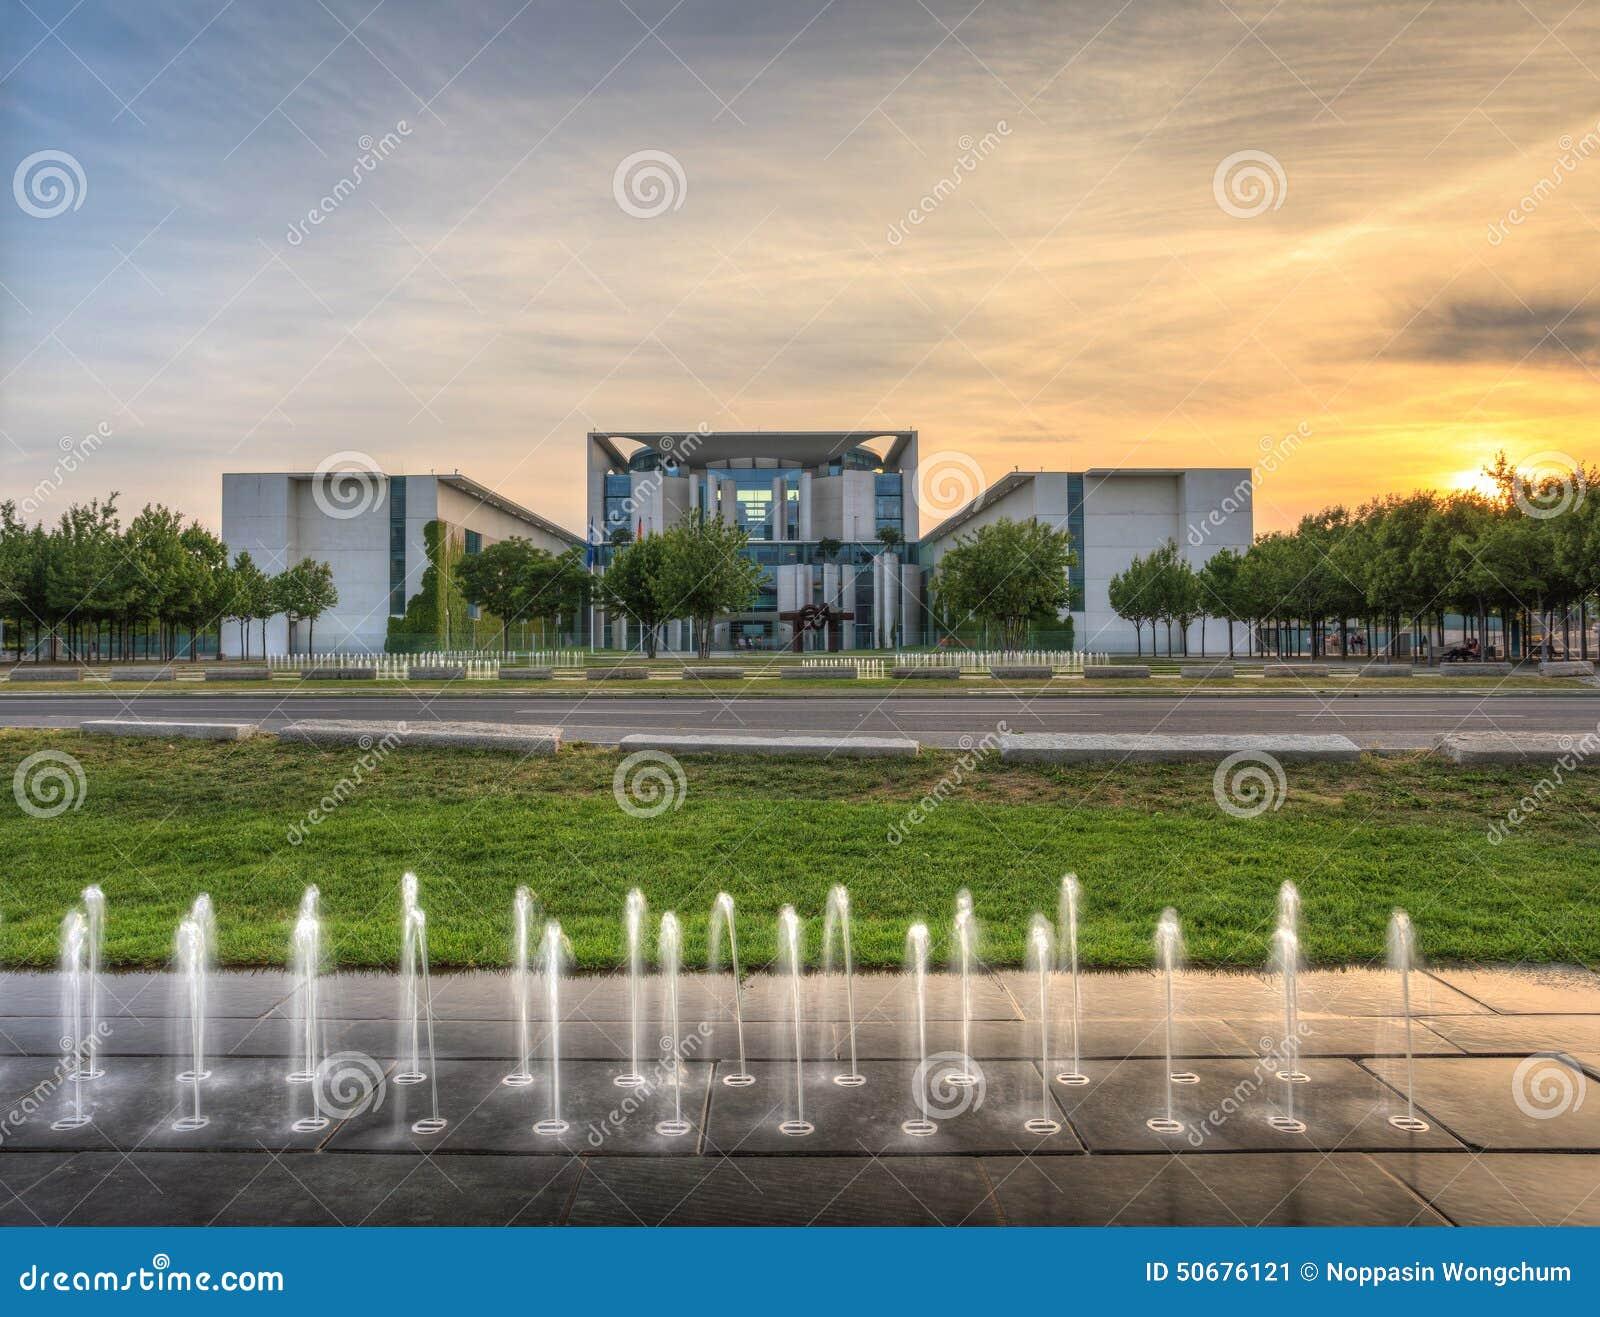 Download 德国大臣官邸在柏林德国 库存图片. 图片 包括有 欧洲, 地标, 大臣官邸, 旅行, berlitz, 德语 - 50676121